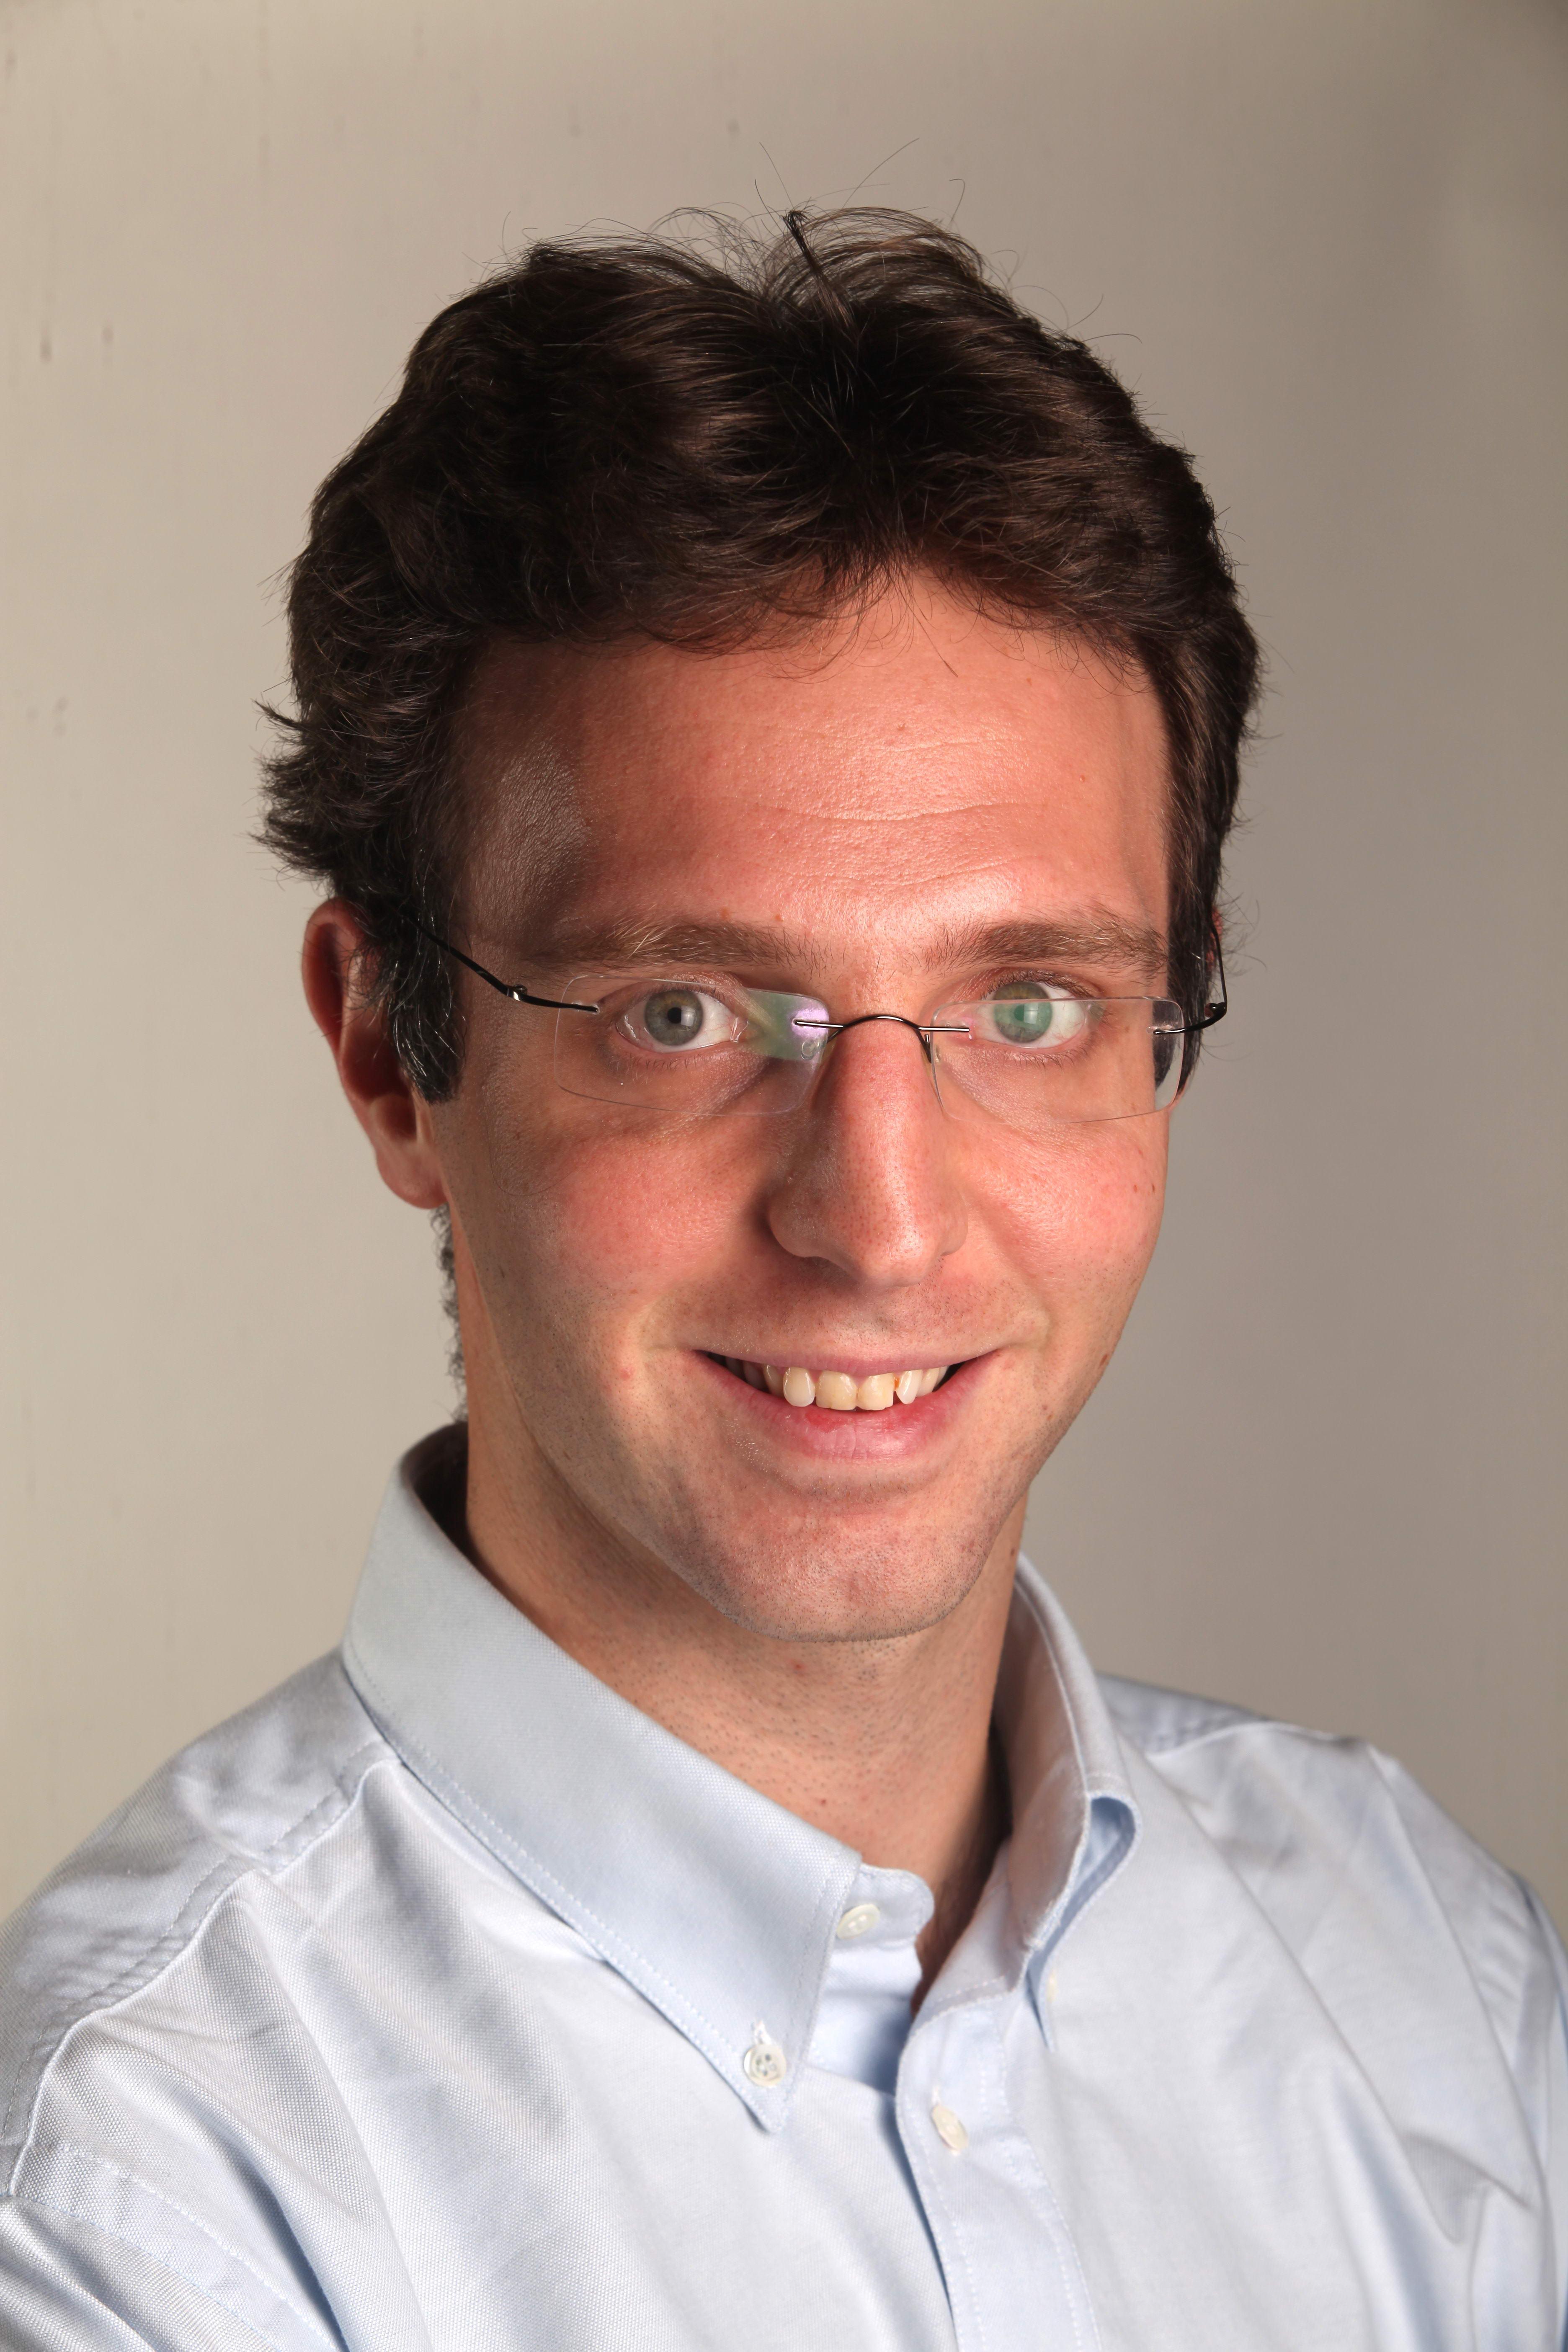 Christophe Demoulin